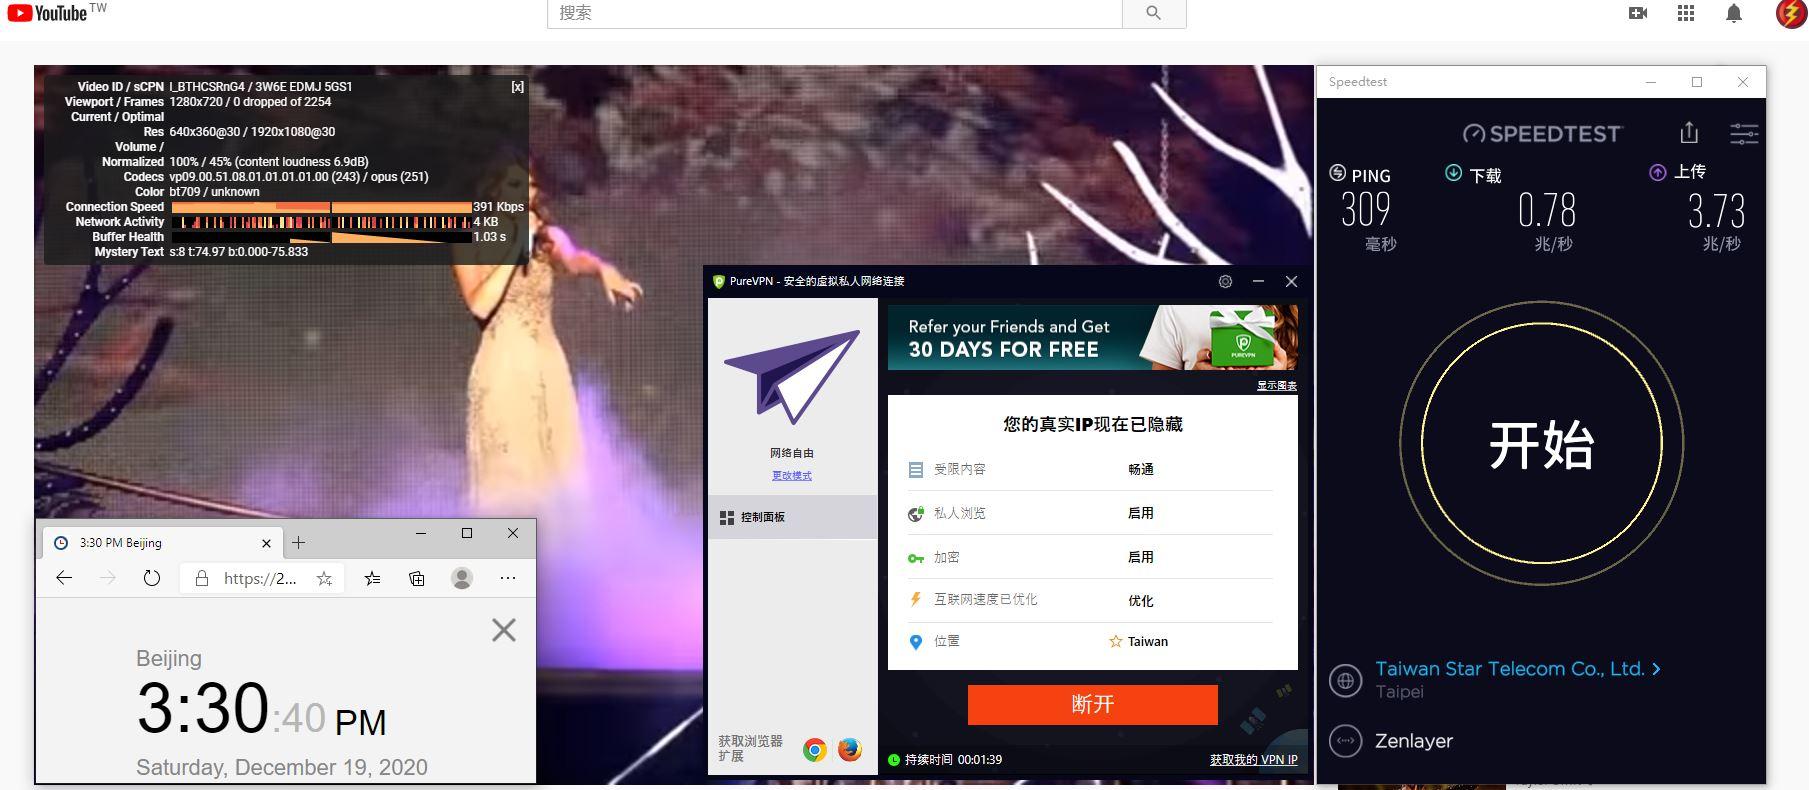 Windows10 PureVPN Taiwan 服务器 中国VPN 翻墙 科学上网 测试 - 20201219